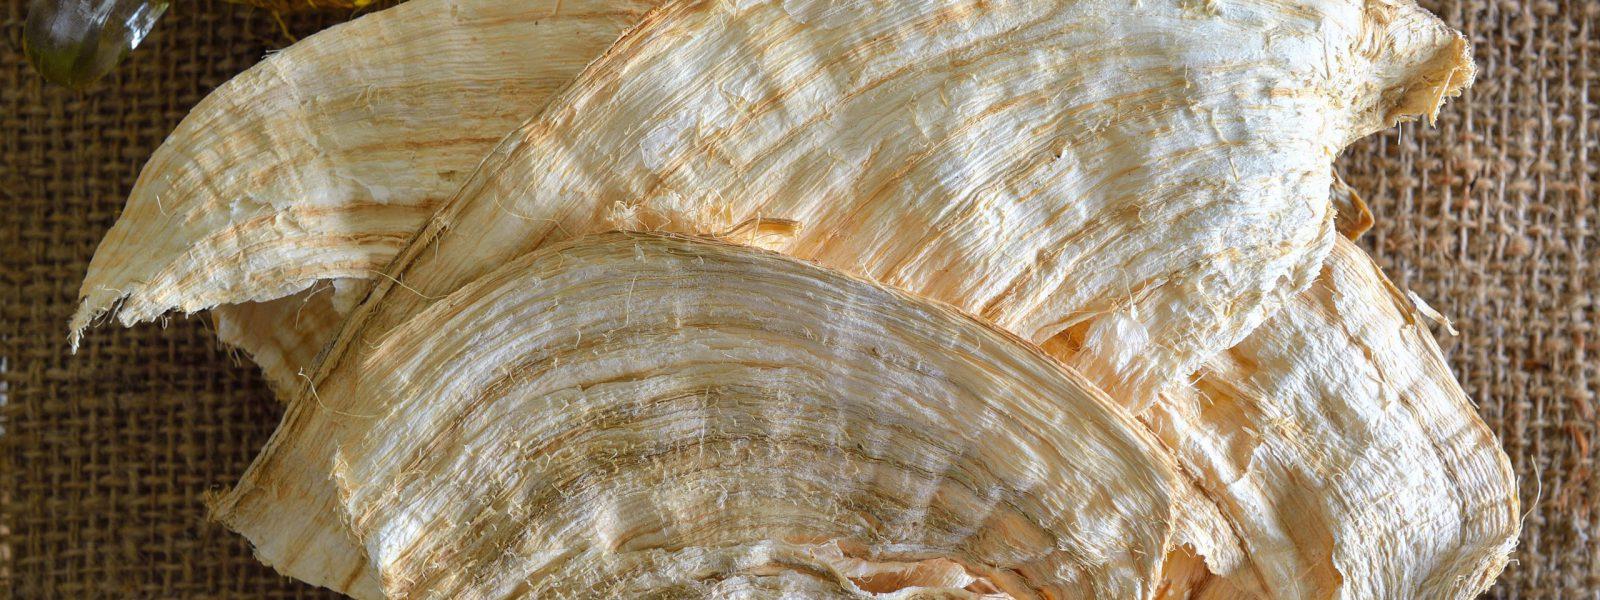 Pueraria mirifica or White Kwao Krua